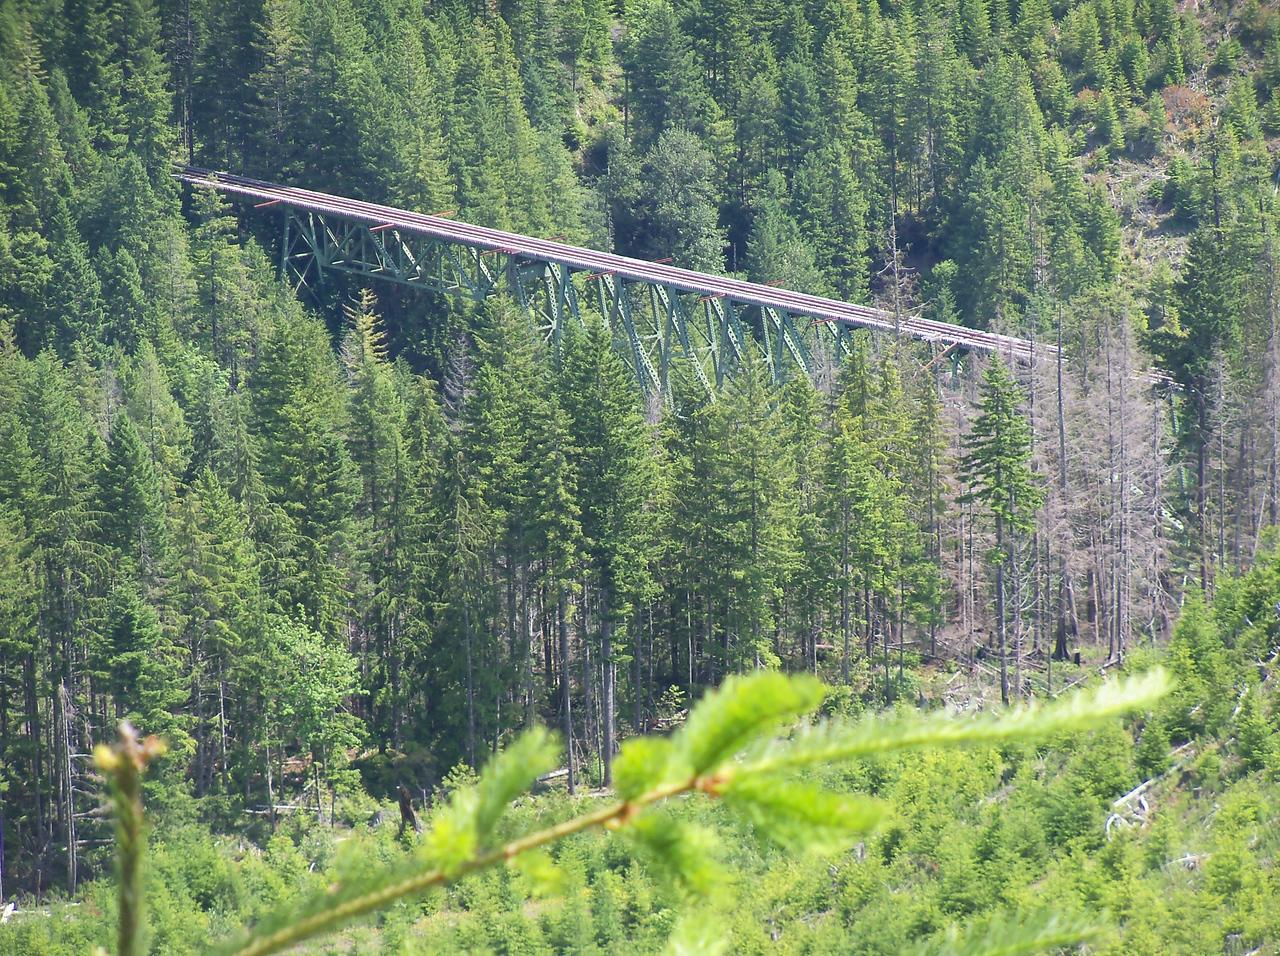 Vance Creek Railroad Bridge from Simpson's Bob Adamek road which Sylvia & I surveyed...